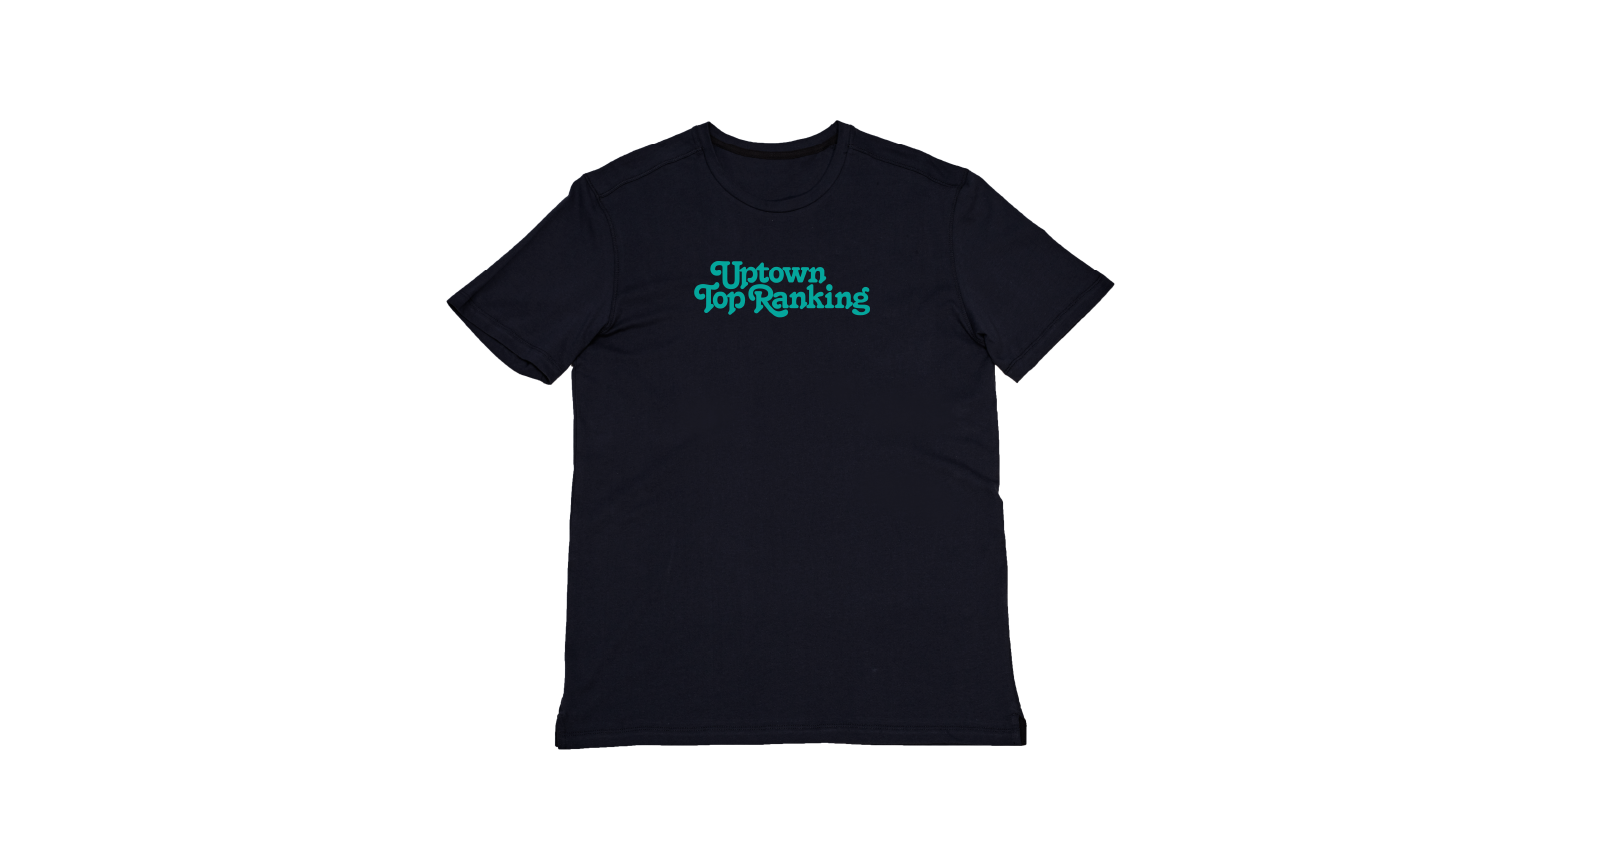 pop-uptown-t-shirt-black